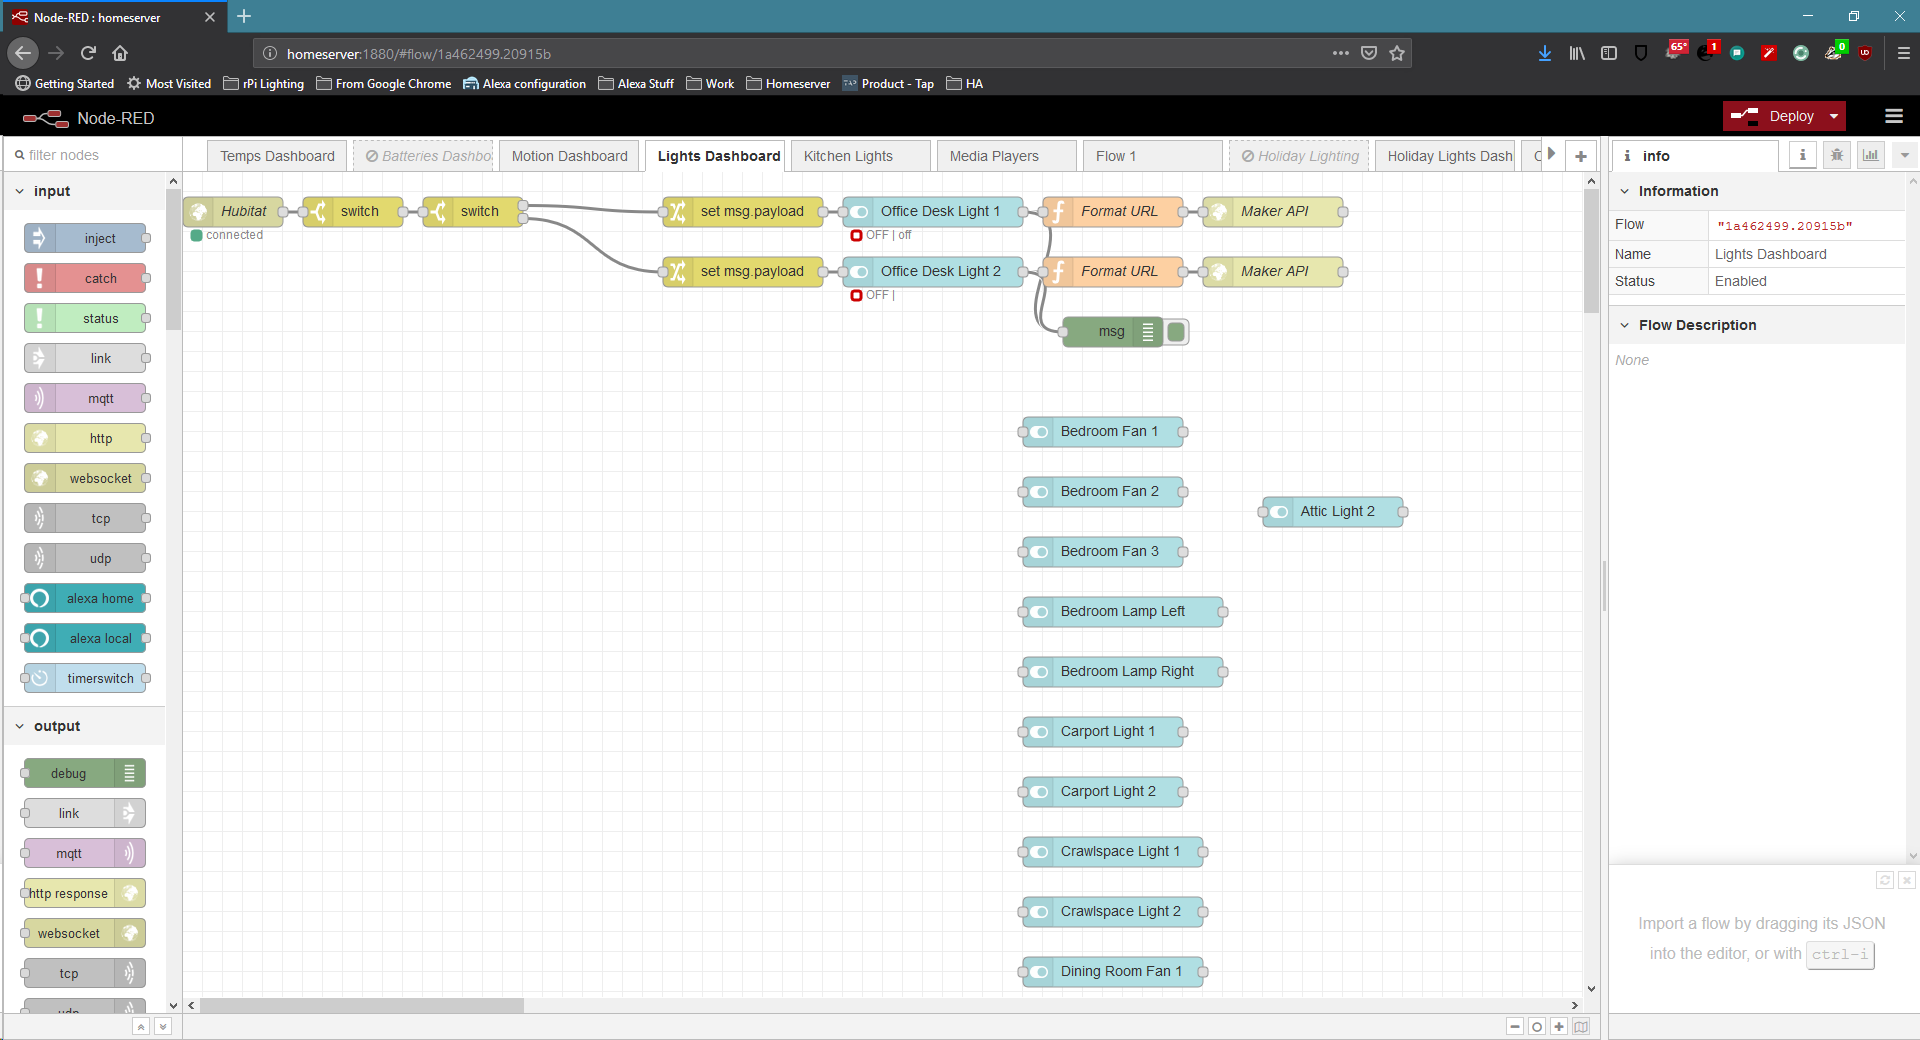 Show off your Maker API creations! - Developers - Hubitat